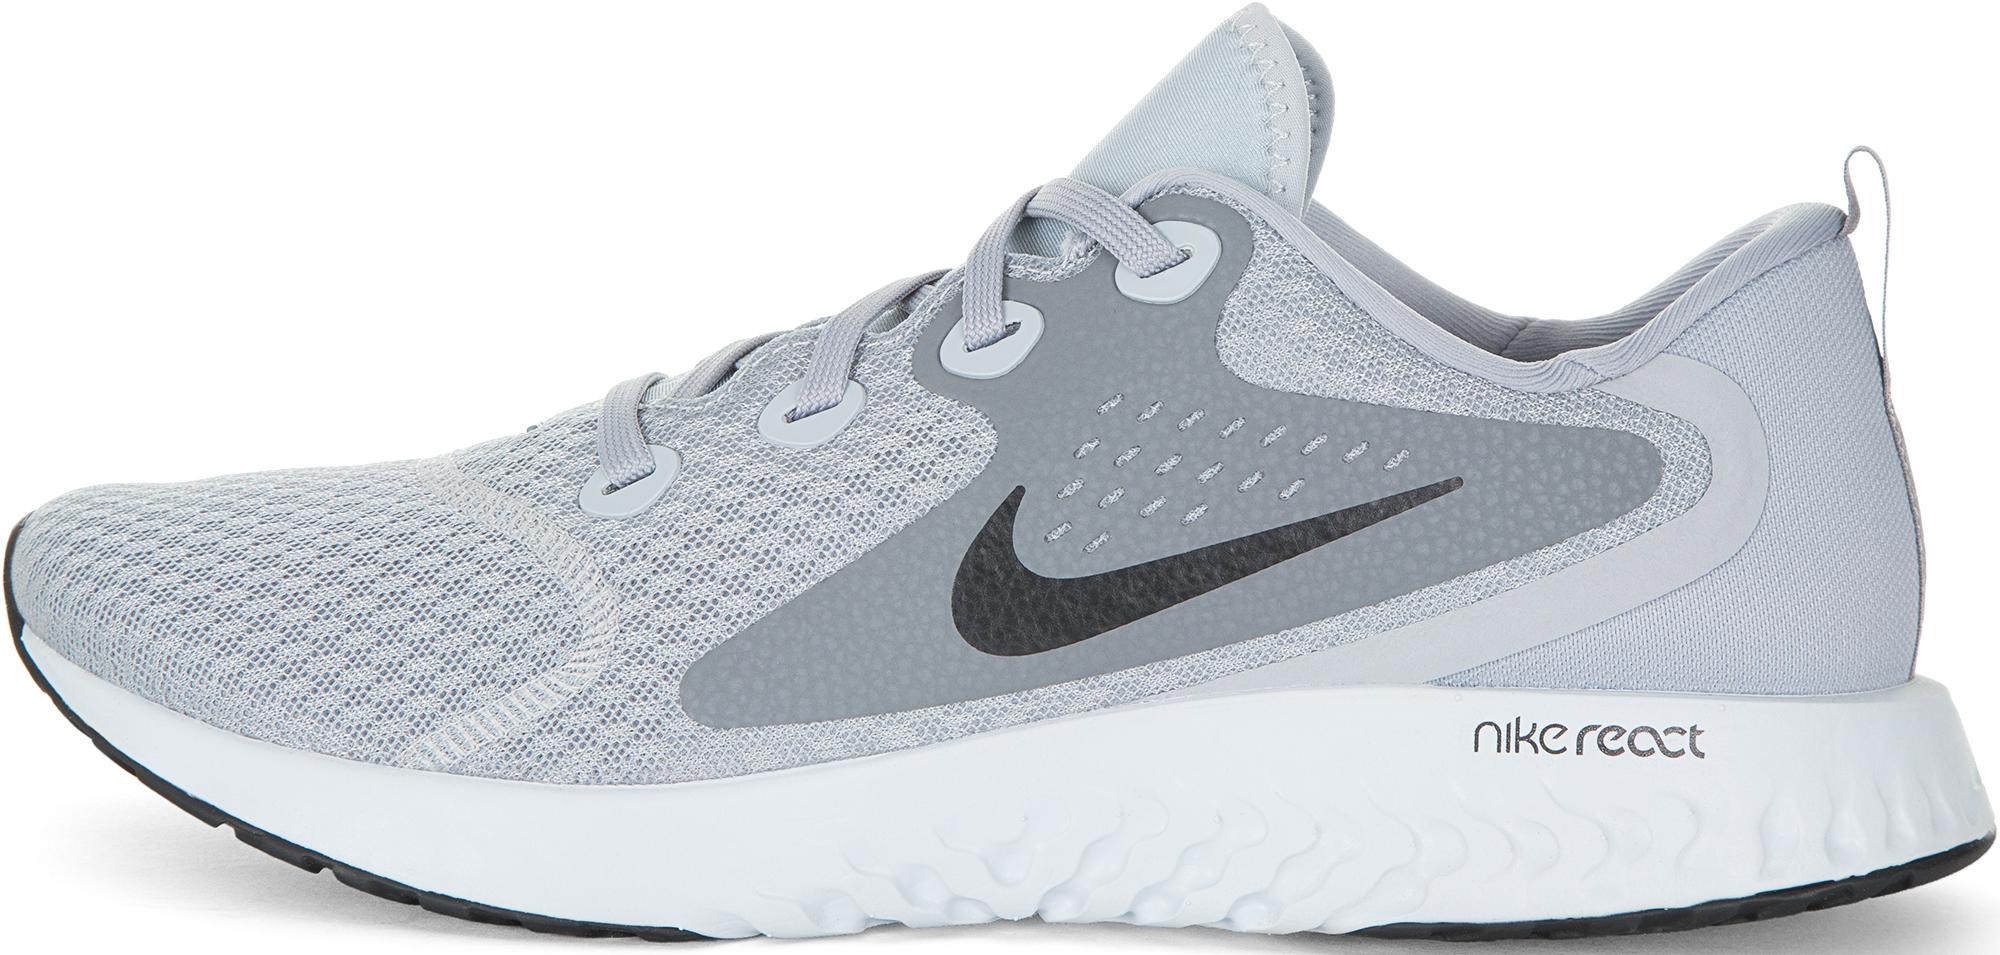 Nike Кроссовки мужские Nike Legend React, размер 40 nike nike legend ti poly capri drft